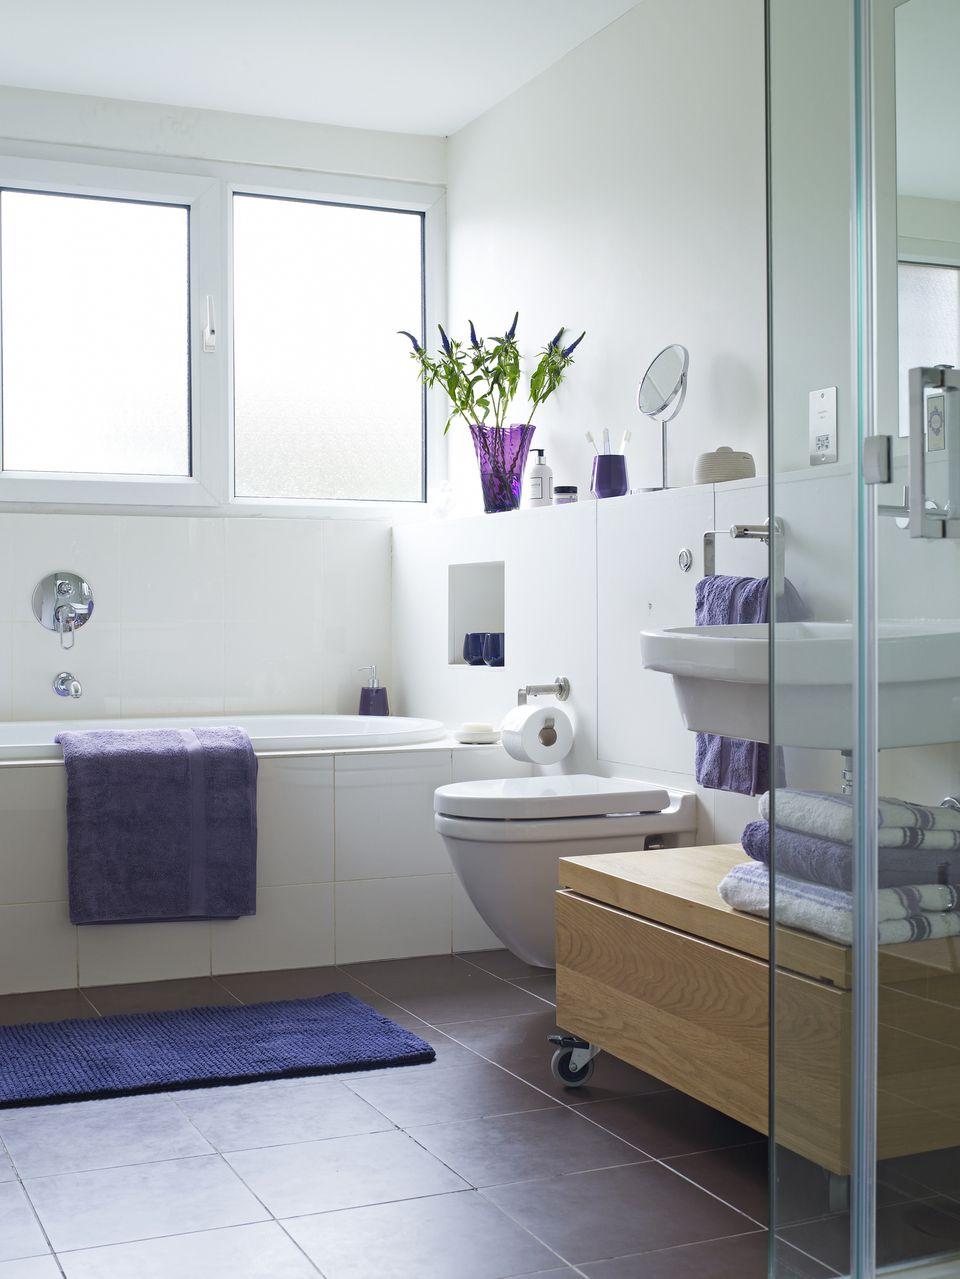 25 Killer Small Bathroom Design Tips on Restroom Ideas  id=27579